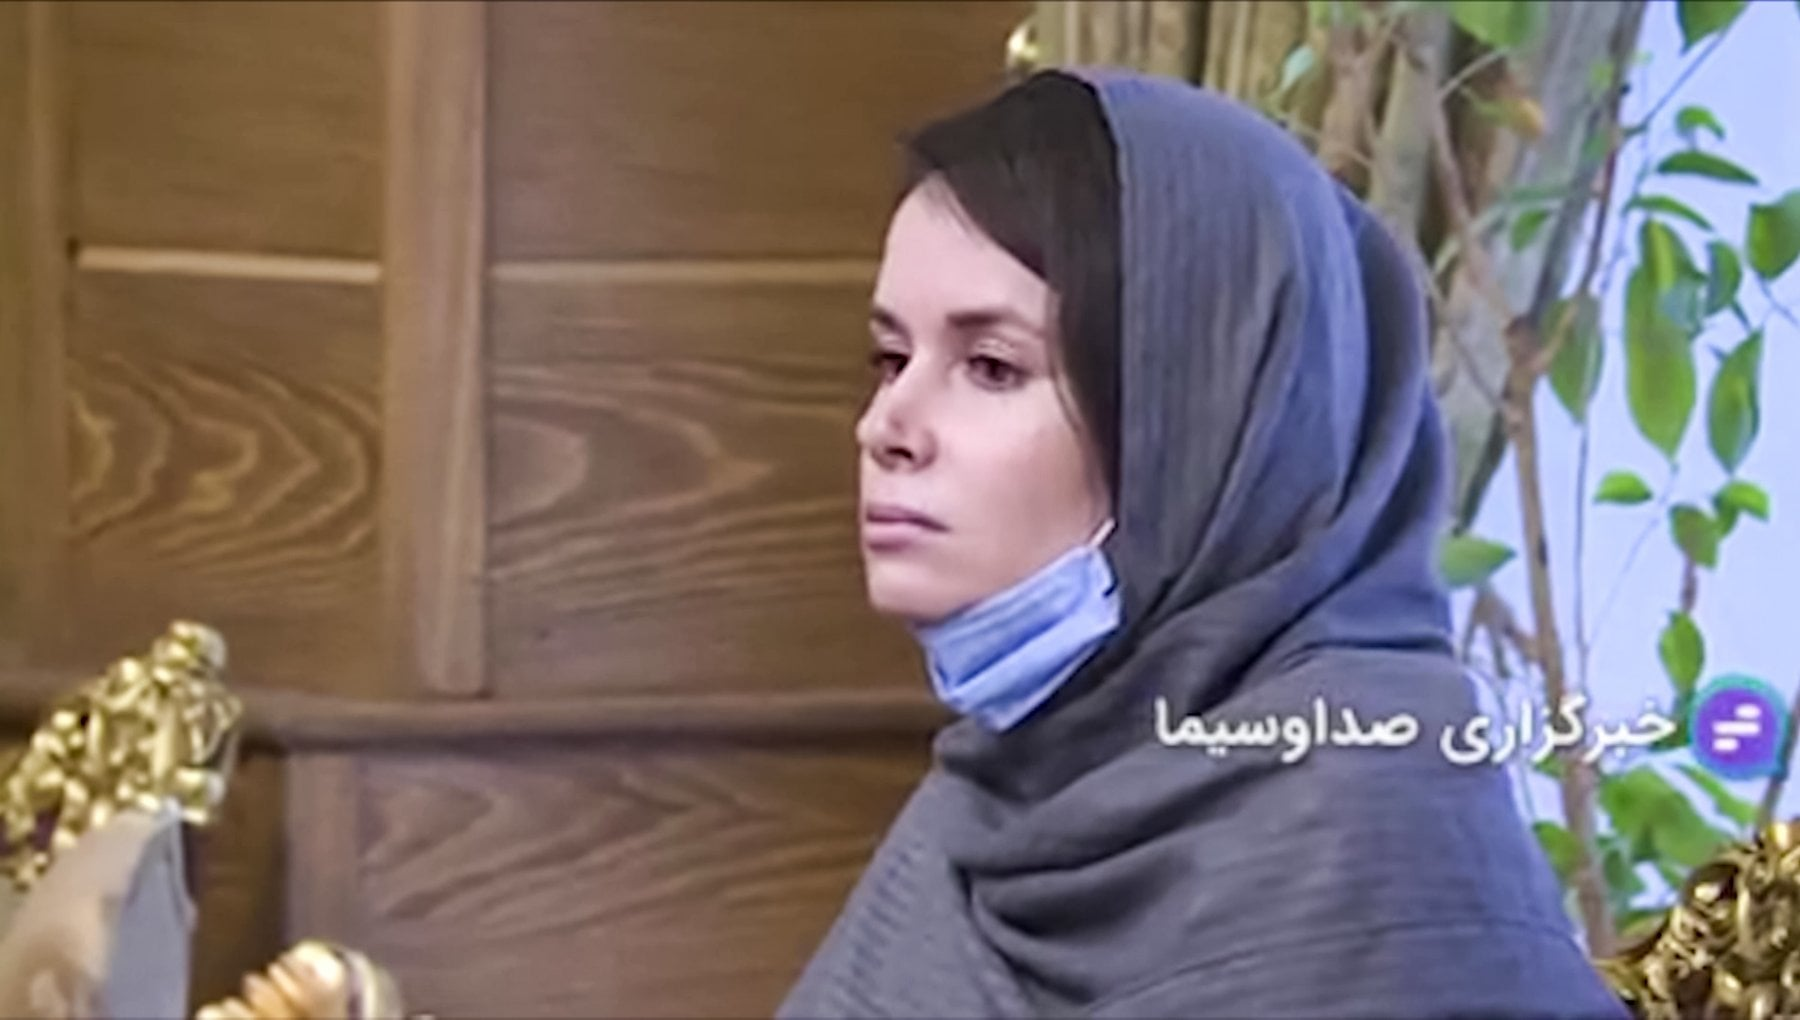 085150896 4466563a 3a76 4018 9c57 bdee7c6b667b - L'Iran libera una ricercatrice australiana: ma è polemica per lo scambio di prigionieri